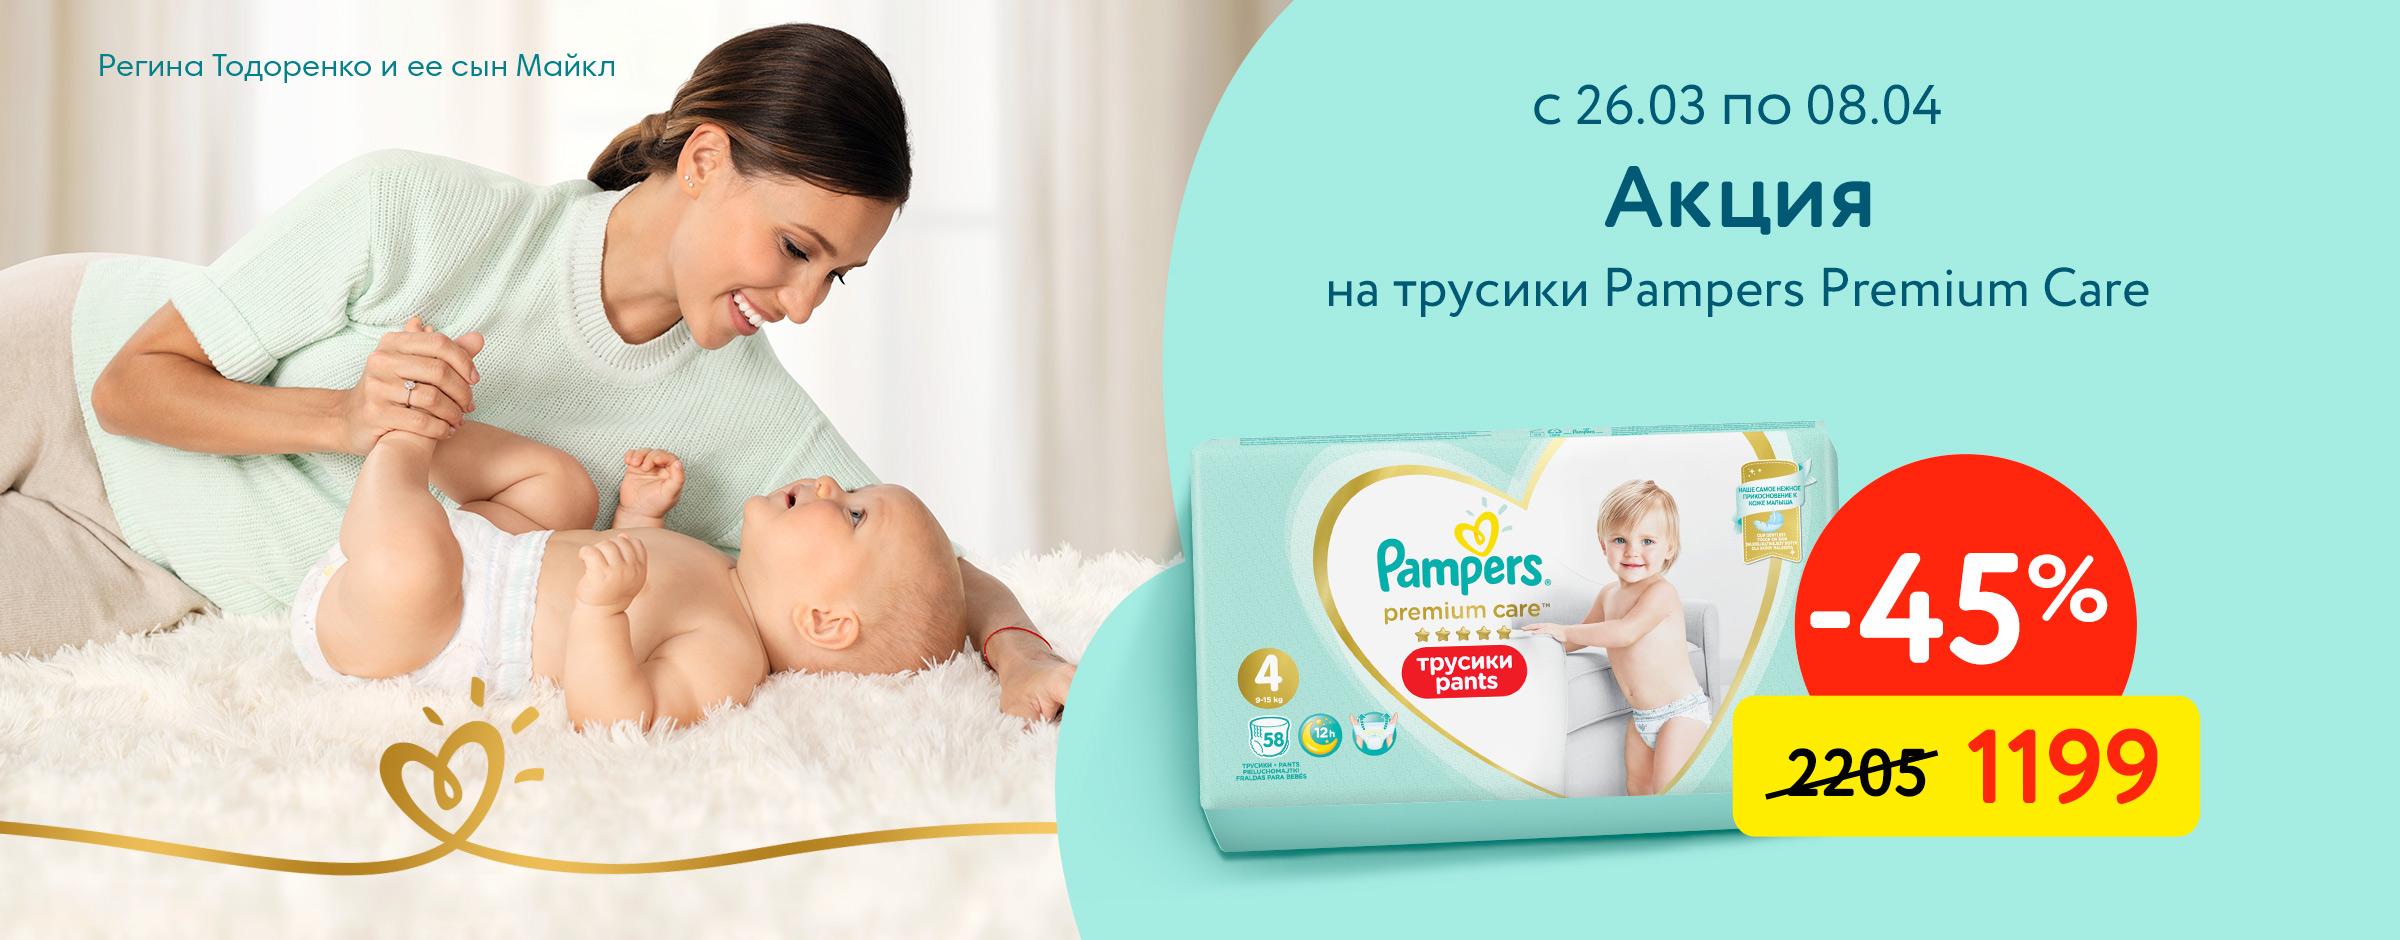 45% на трусики Pampers Premium care Трусики